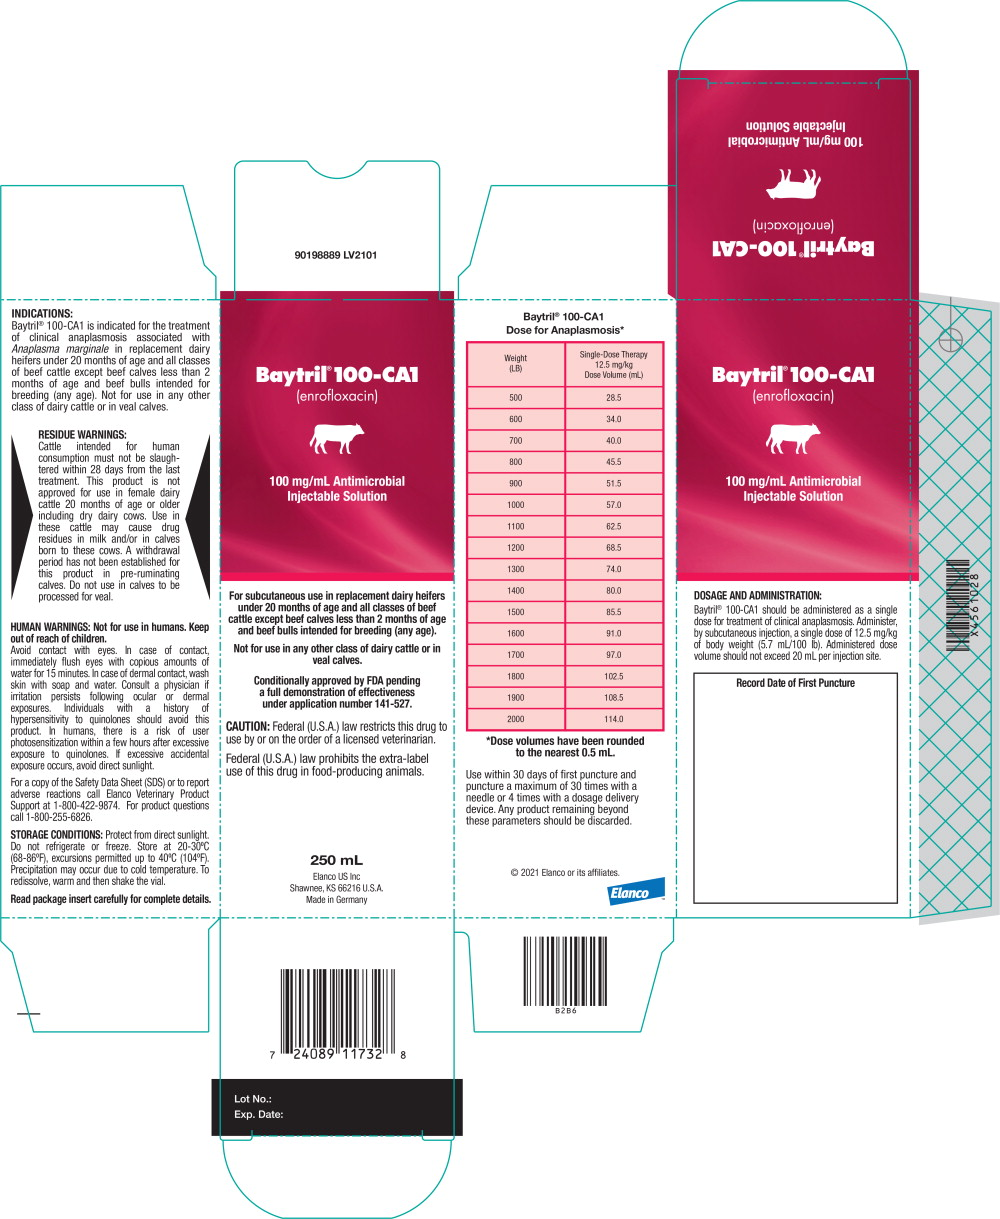 Principal Display Panel - 250 mL Carton Label